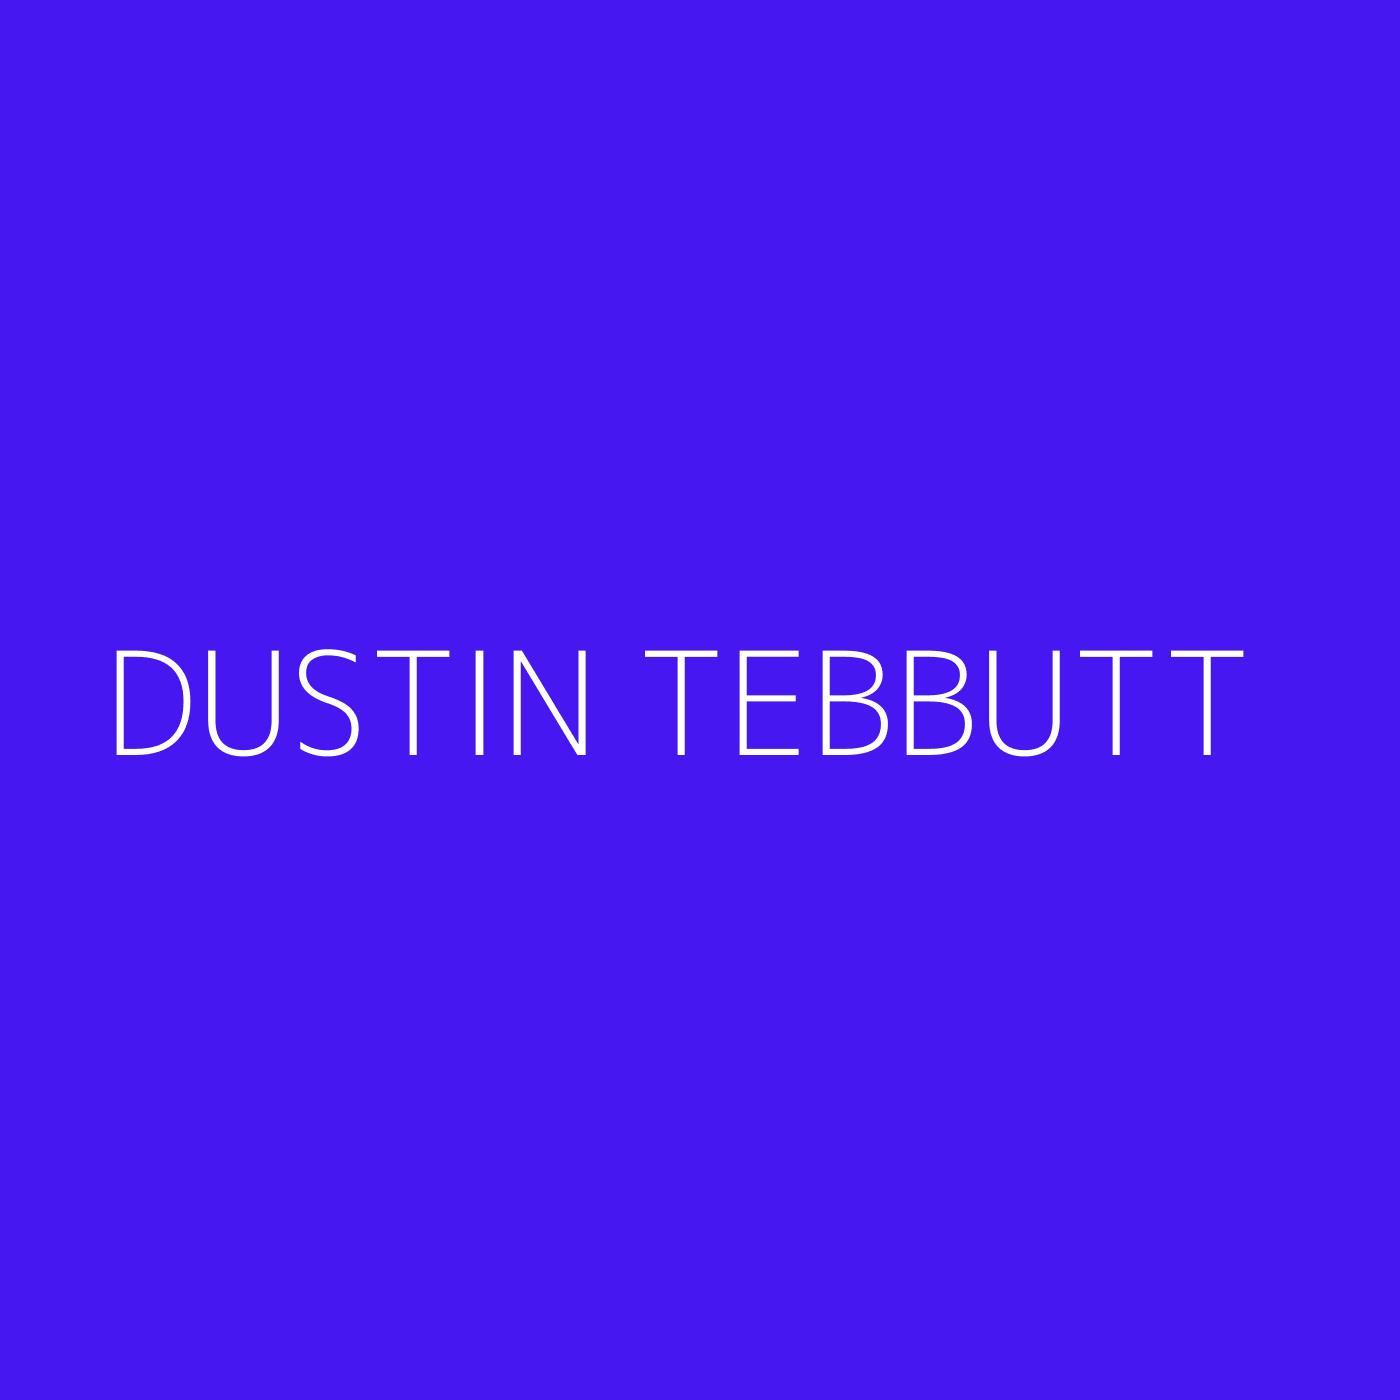 Dustin Tebbutt Playlist Artwork